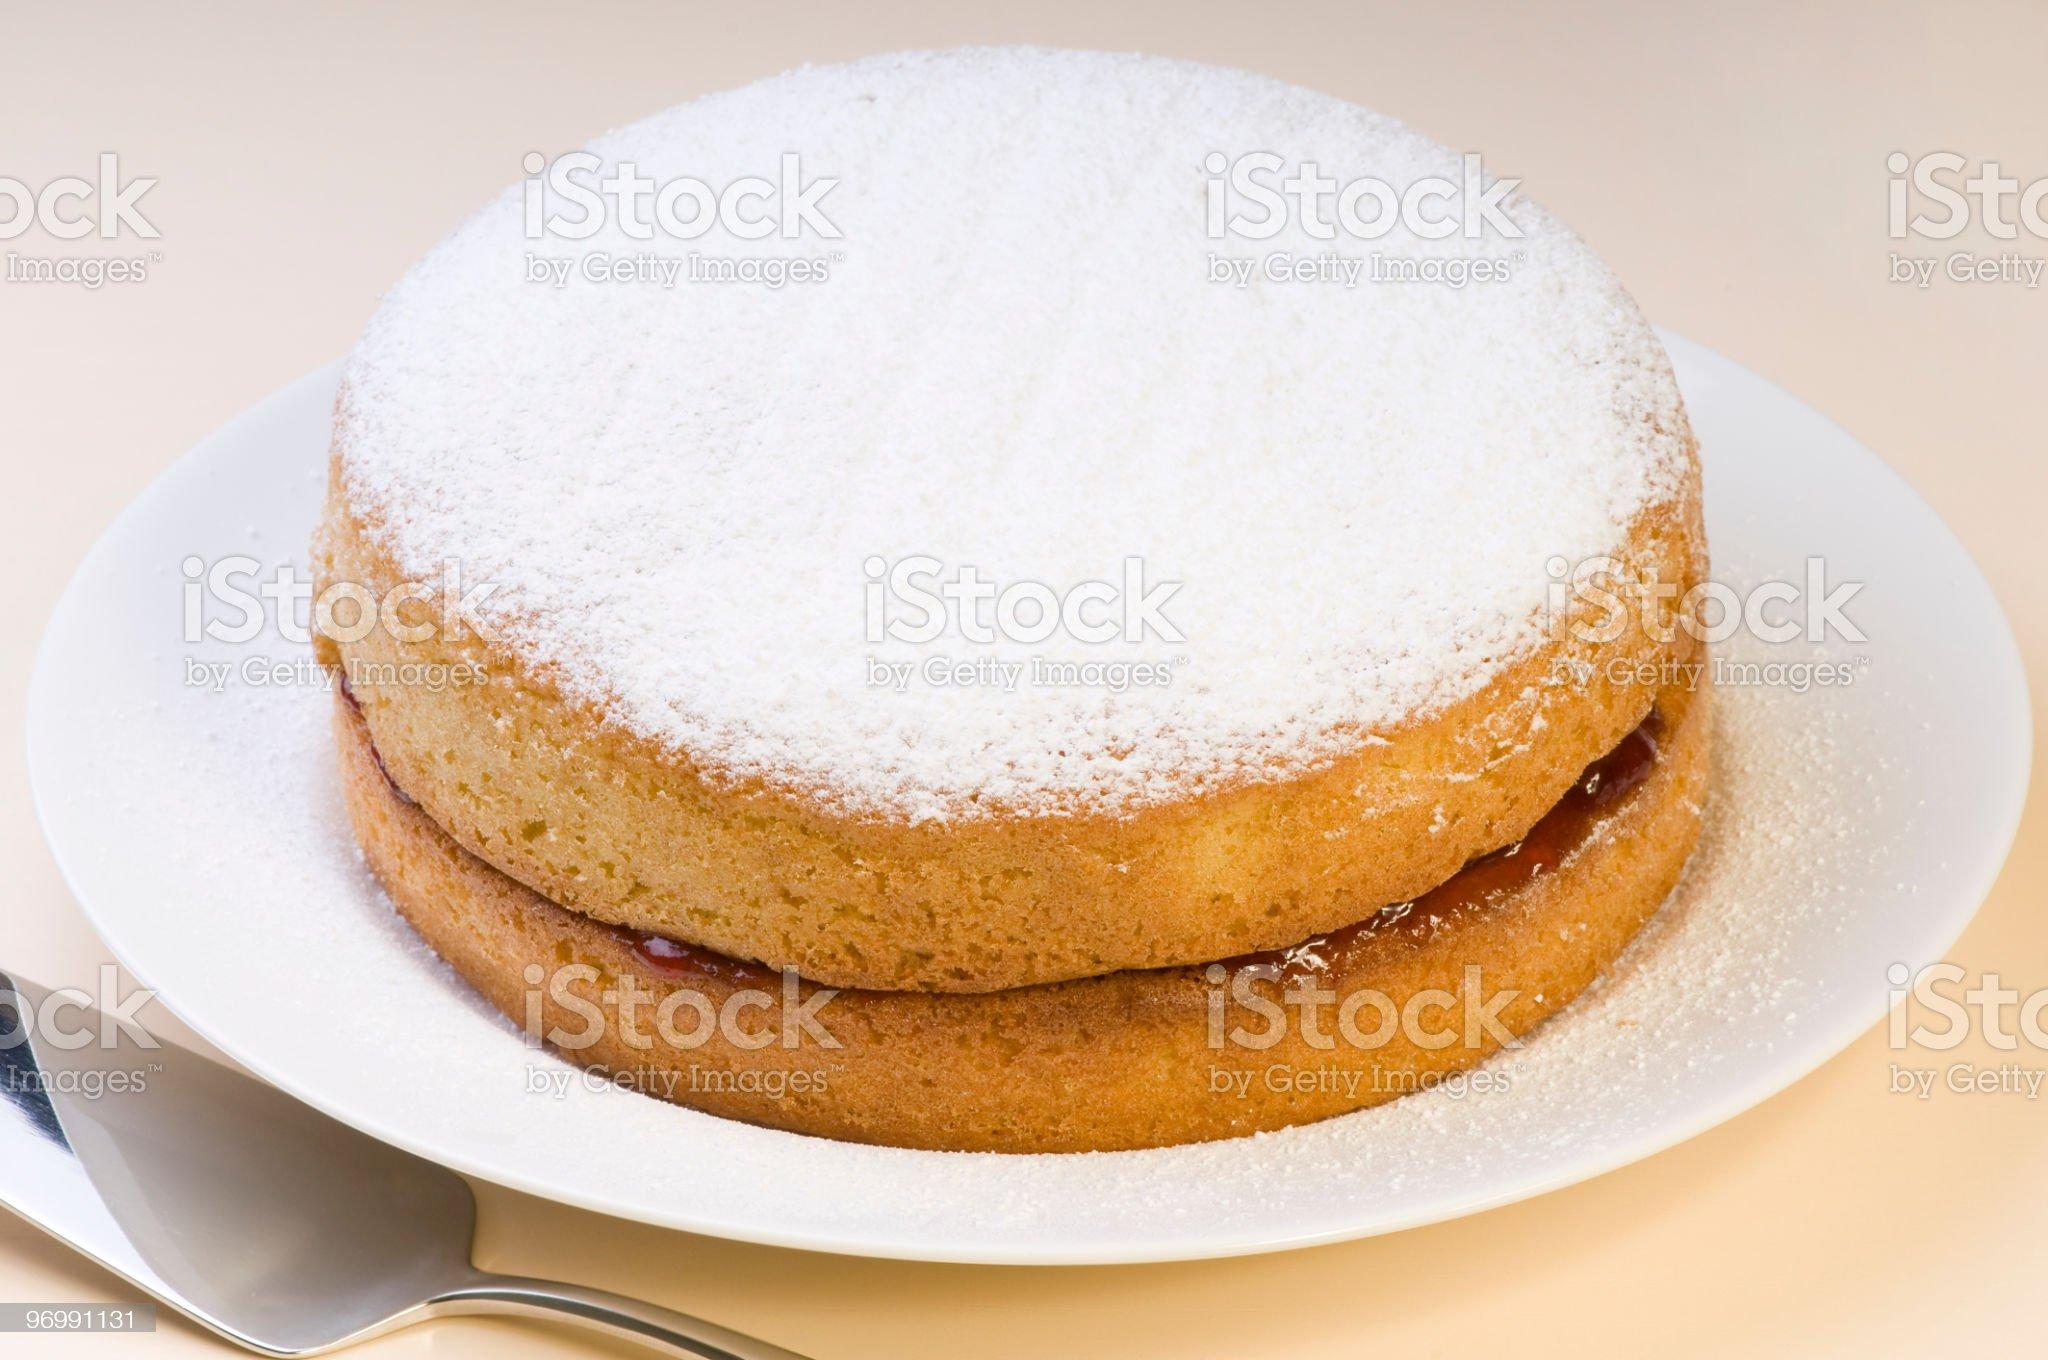 Victoria sponge cake with powdered sugar royalty-free stock photo